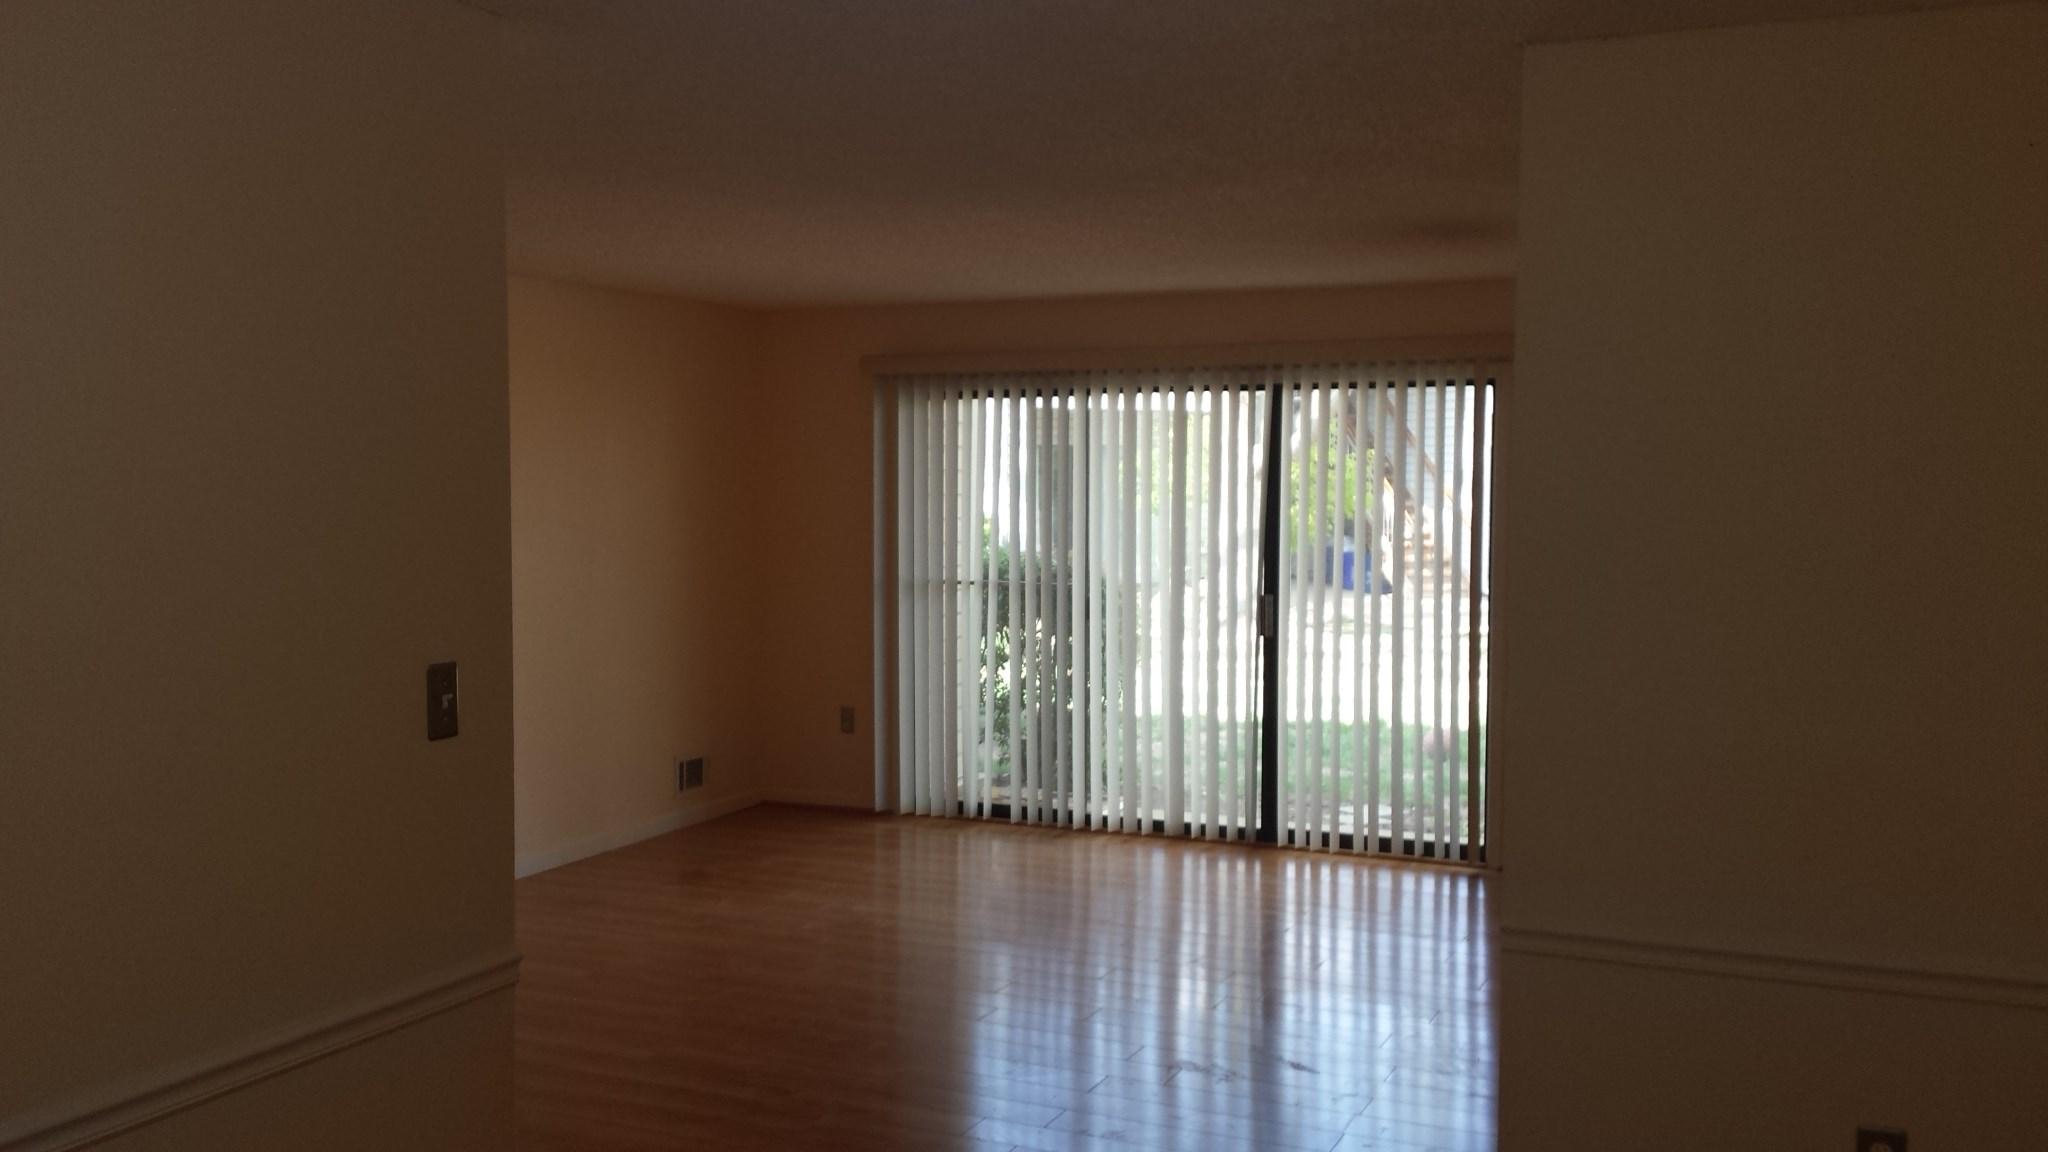 31 x 17 basement windows